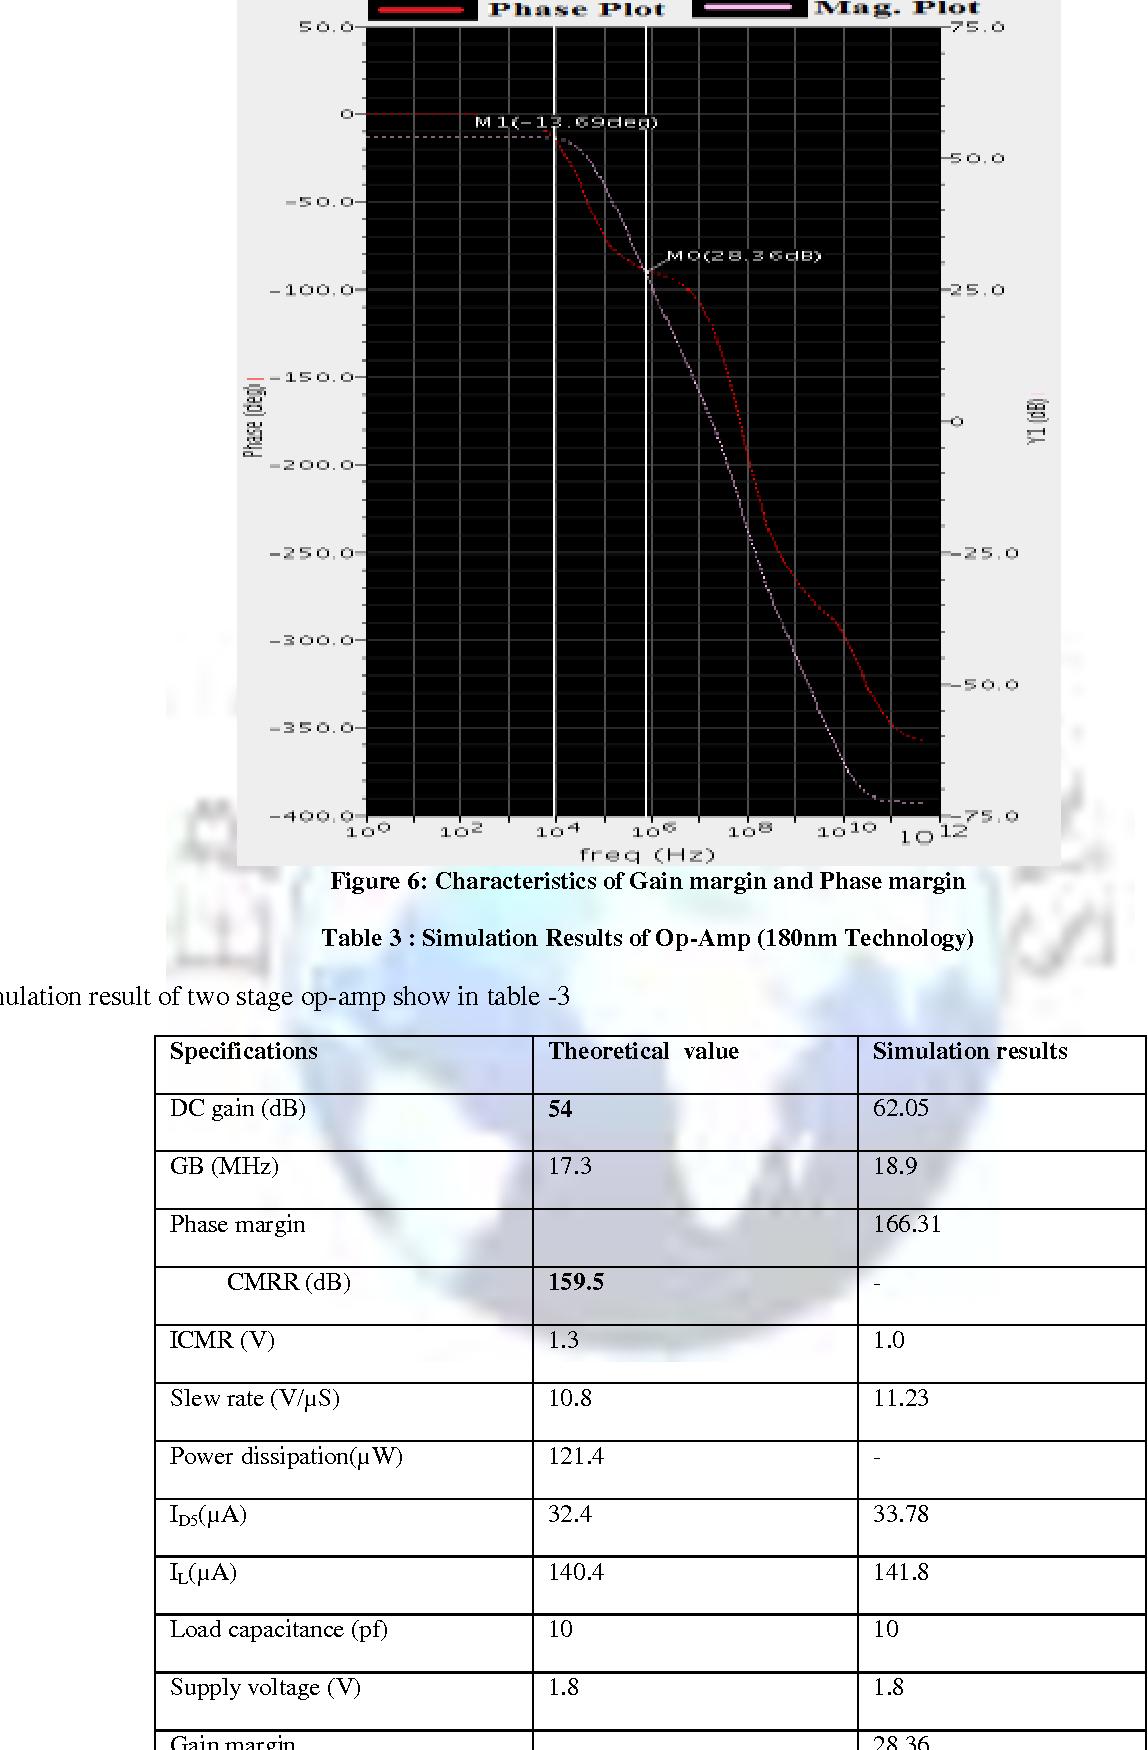 Figure 6: Characteristics of Gain margin and Phase margin